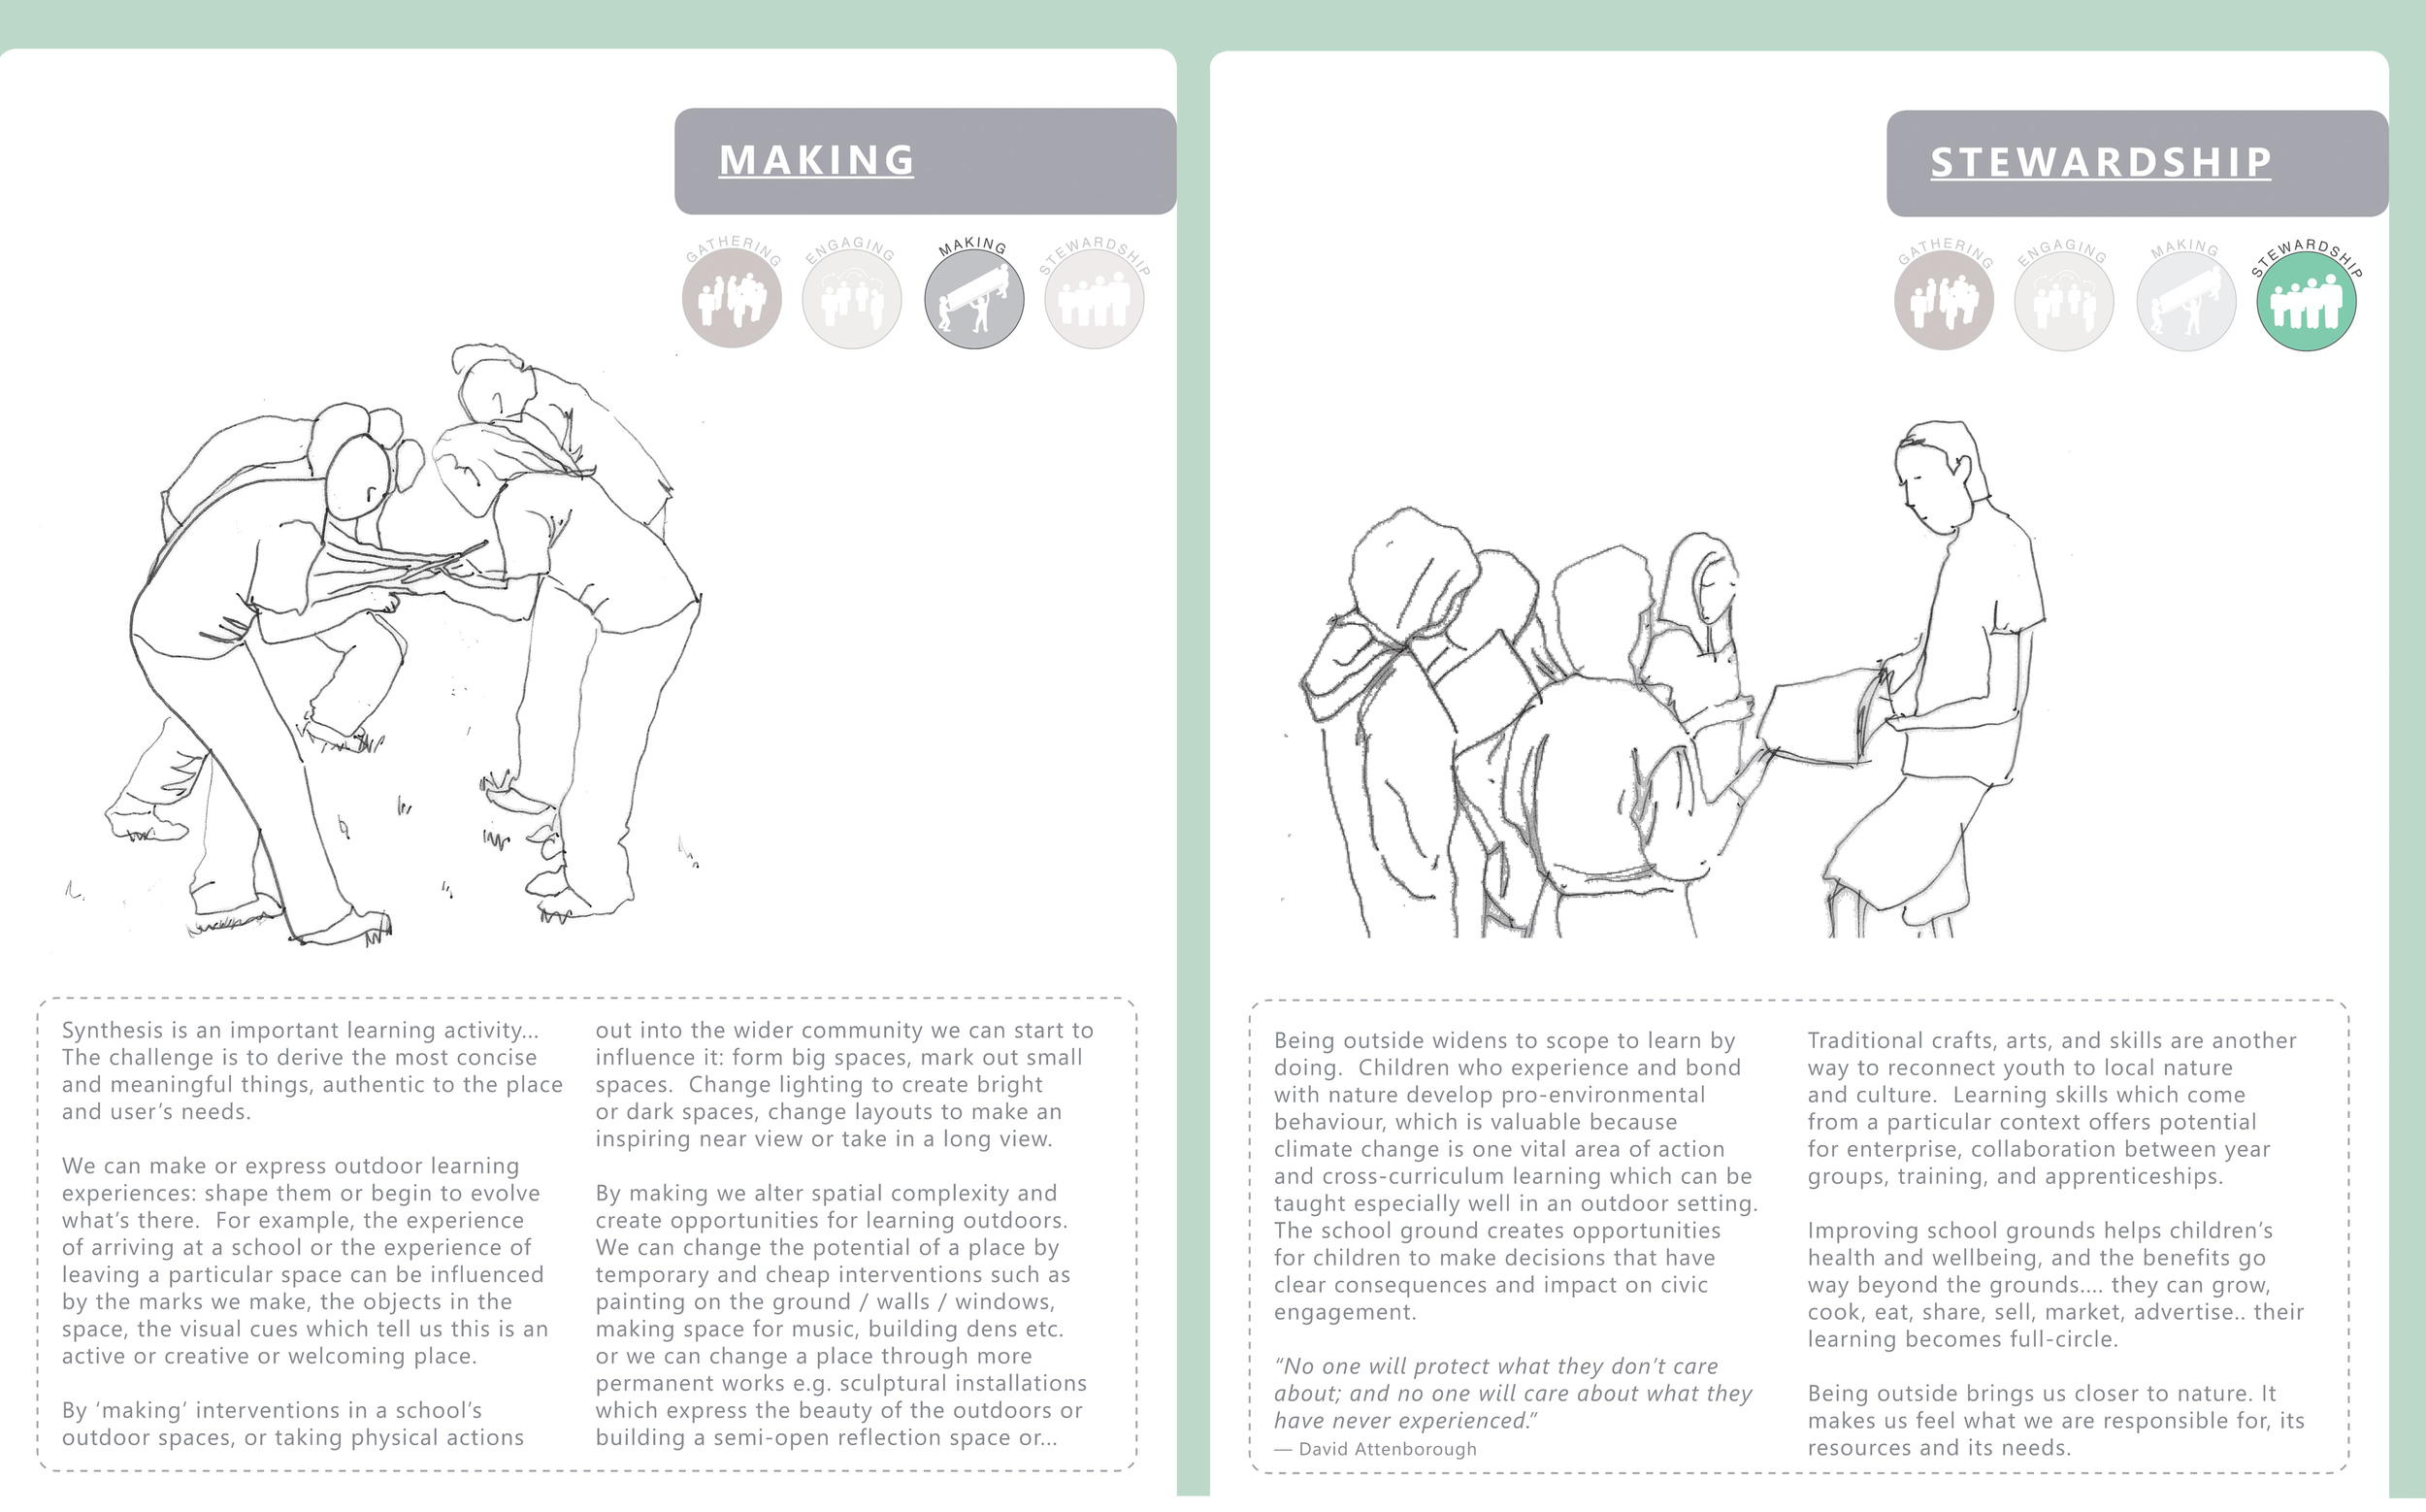 Settings for learning_prototype_resources_make_stewardship.jpg